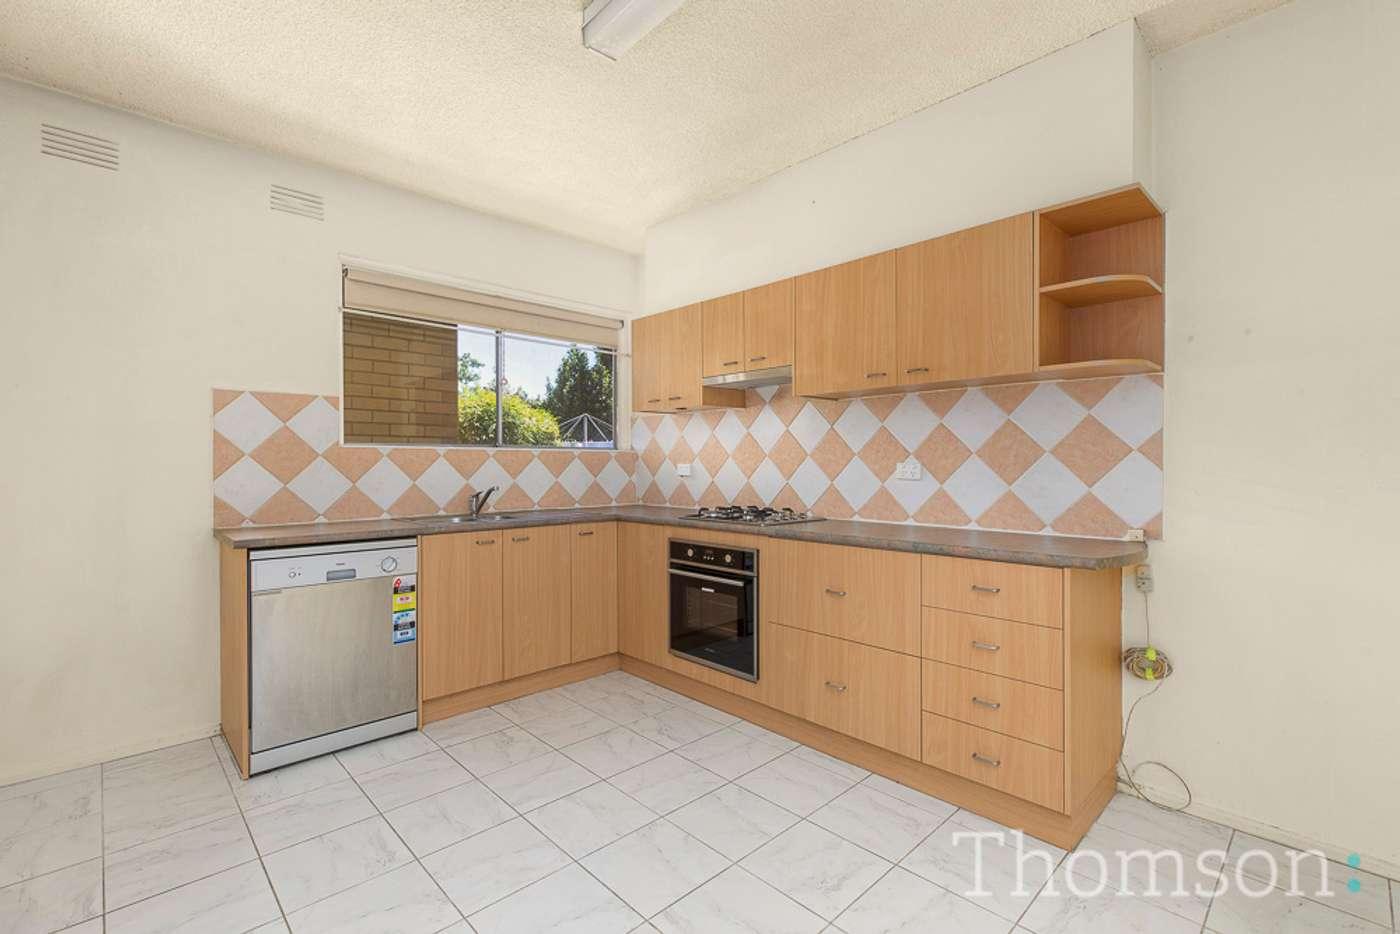 Main view of Homely apartment listing, 1/35 Maitland Street, Glen Iris VIC 3146